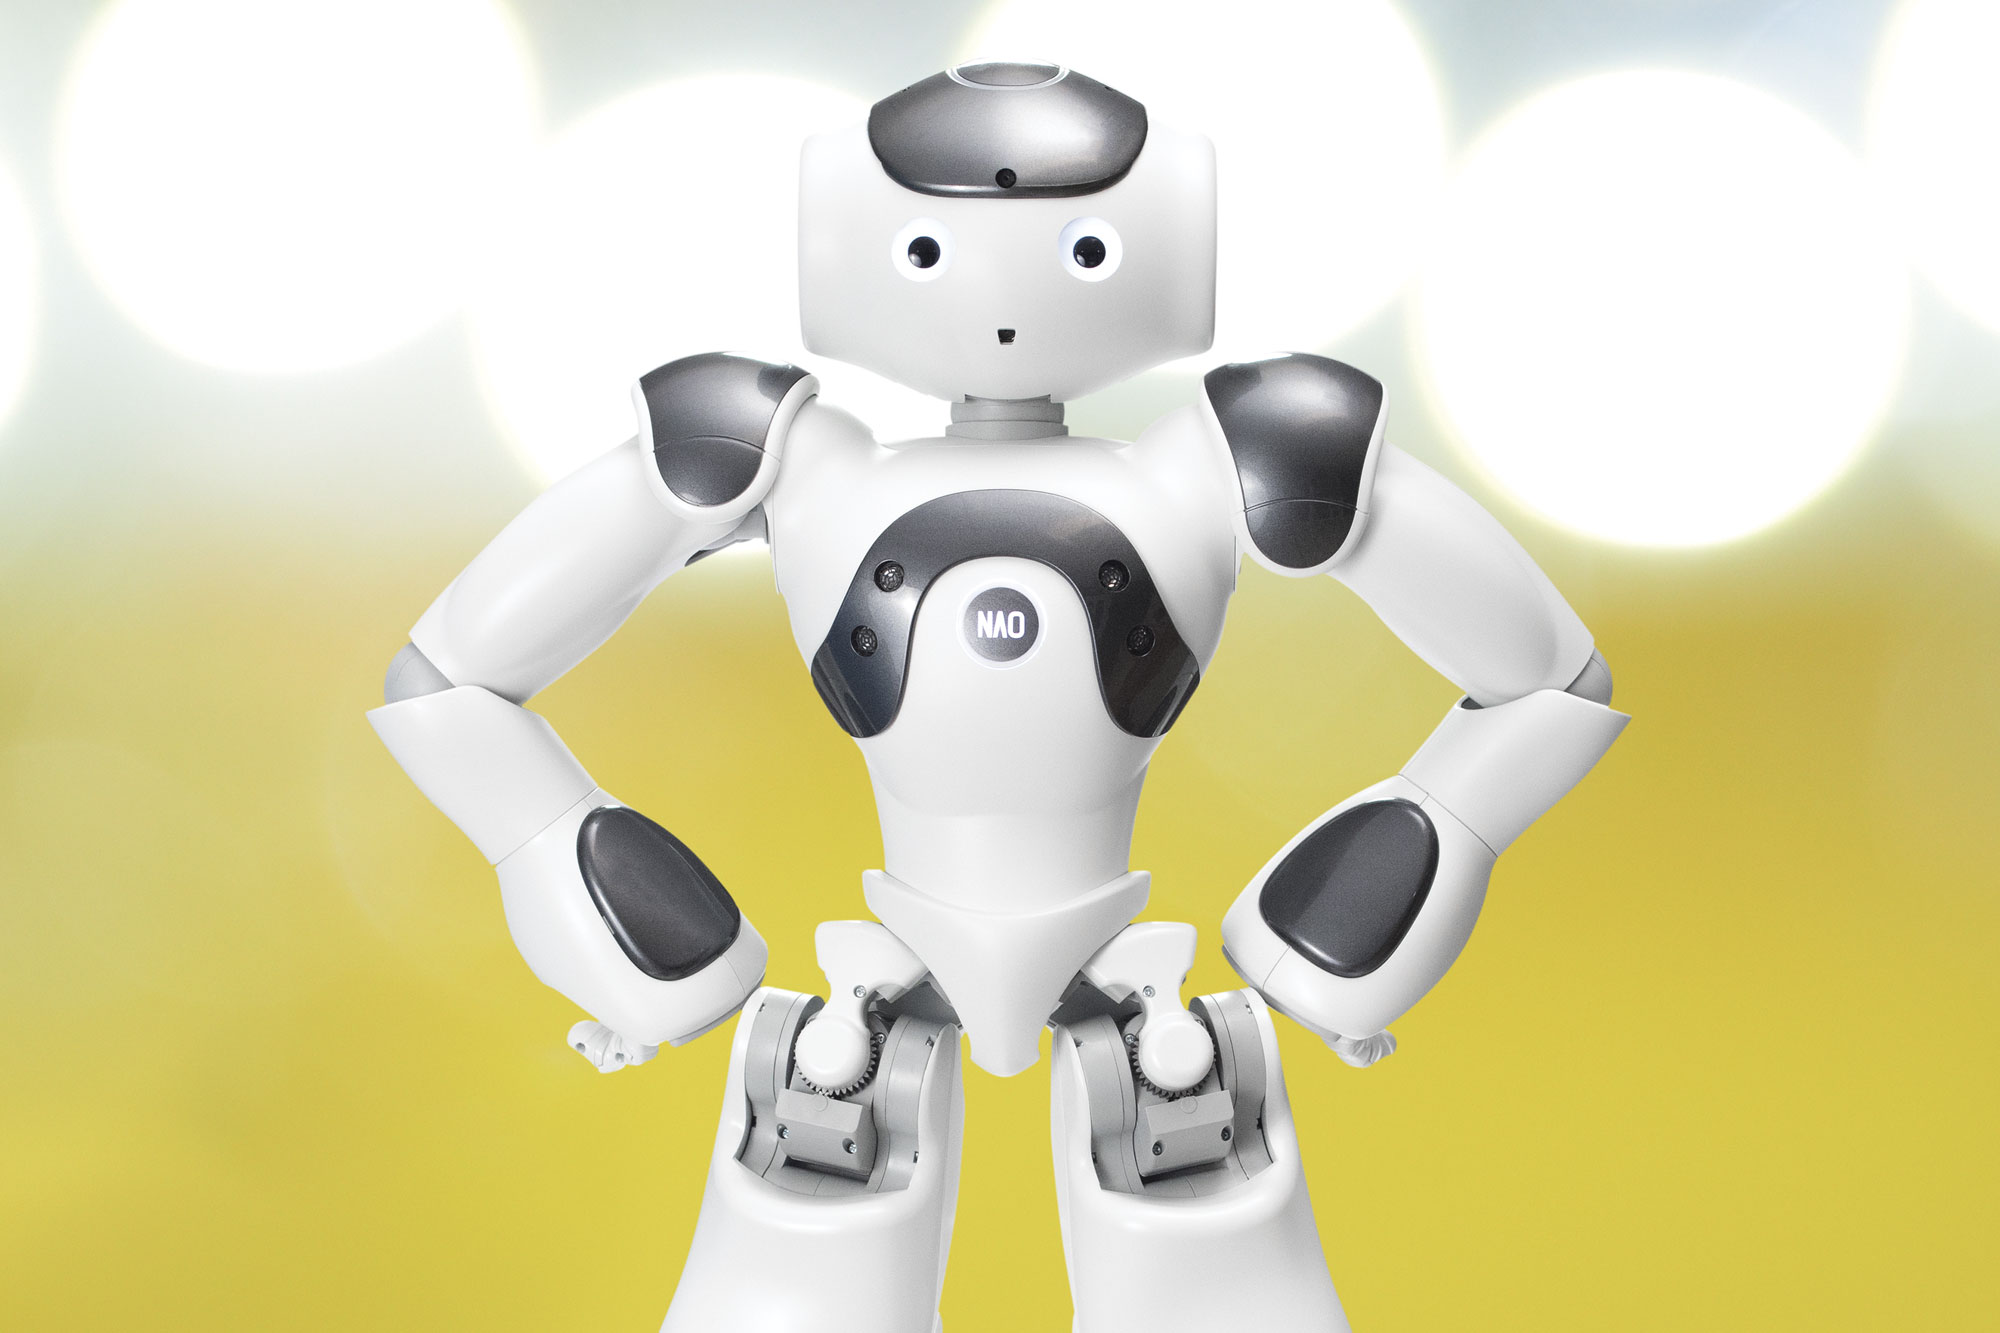 NAO ヒューマノイドロボット - JTP 日本サード・パーティ株式会社